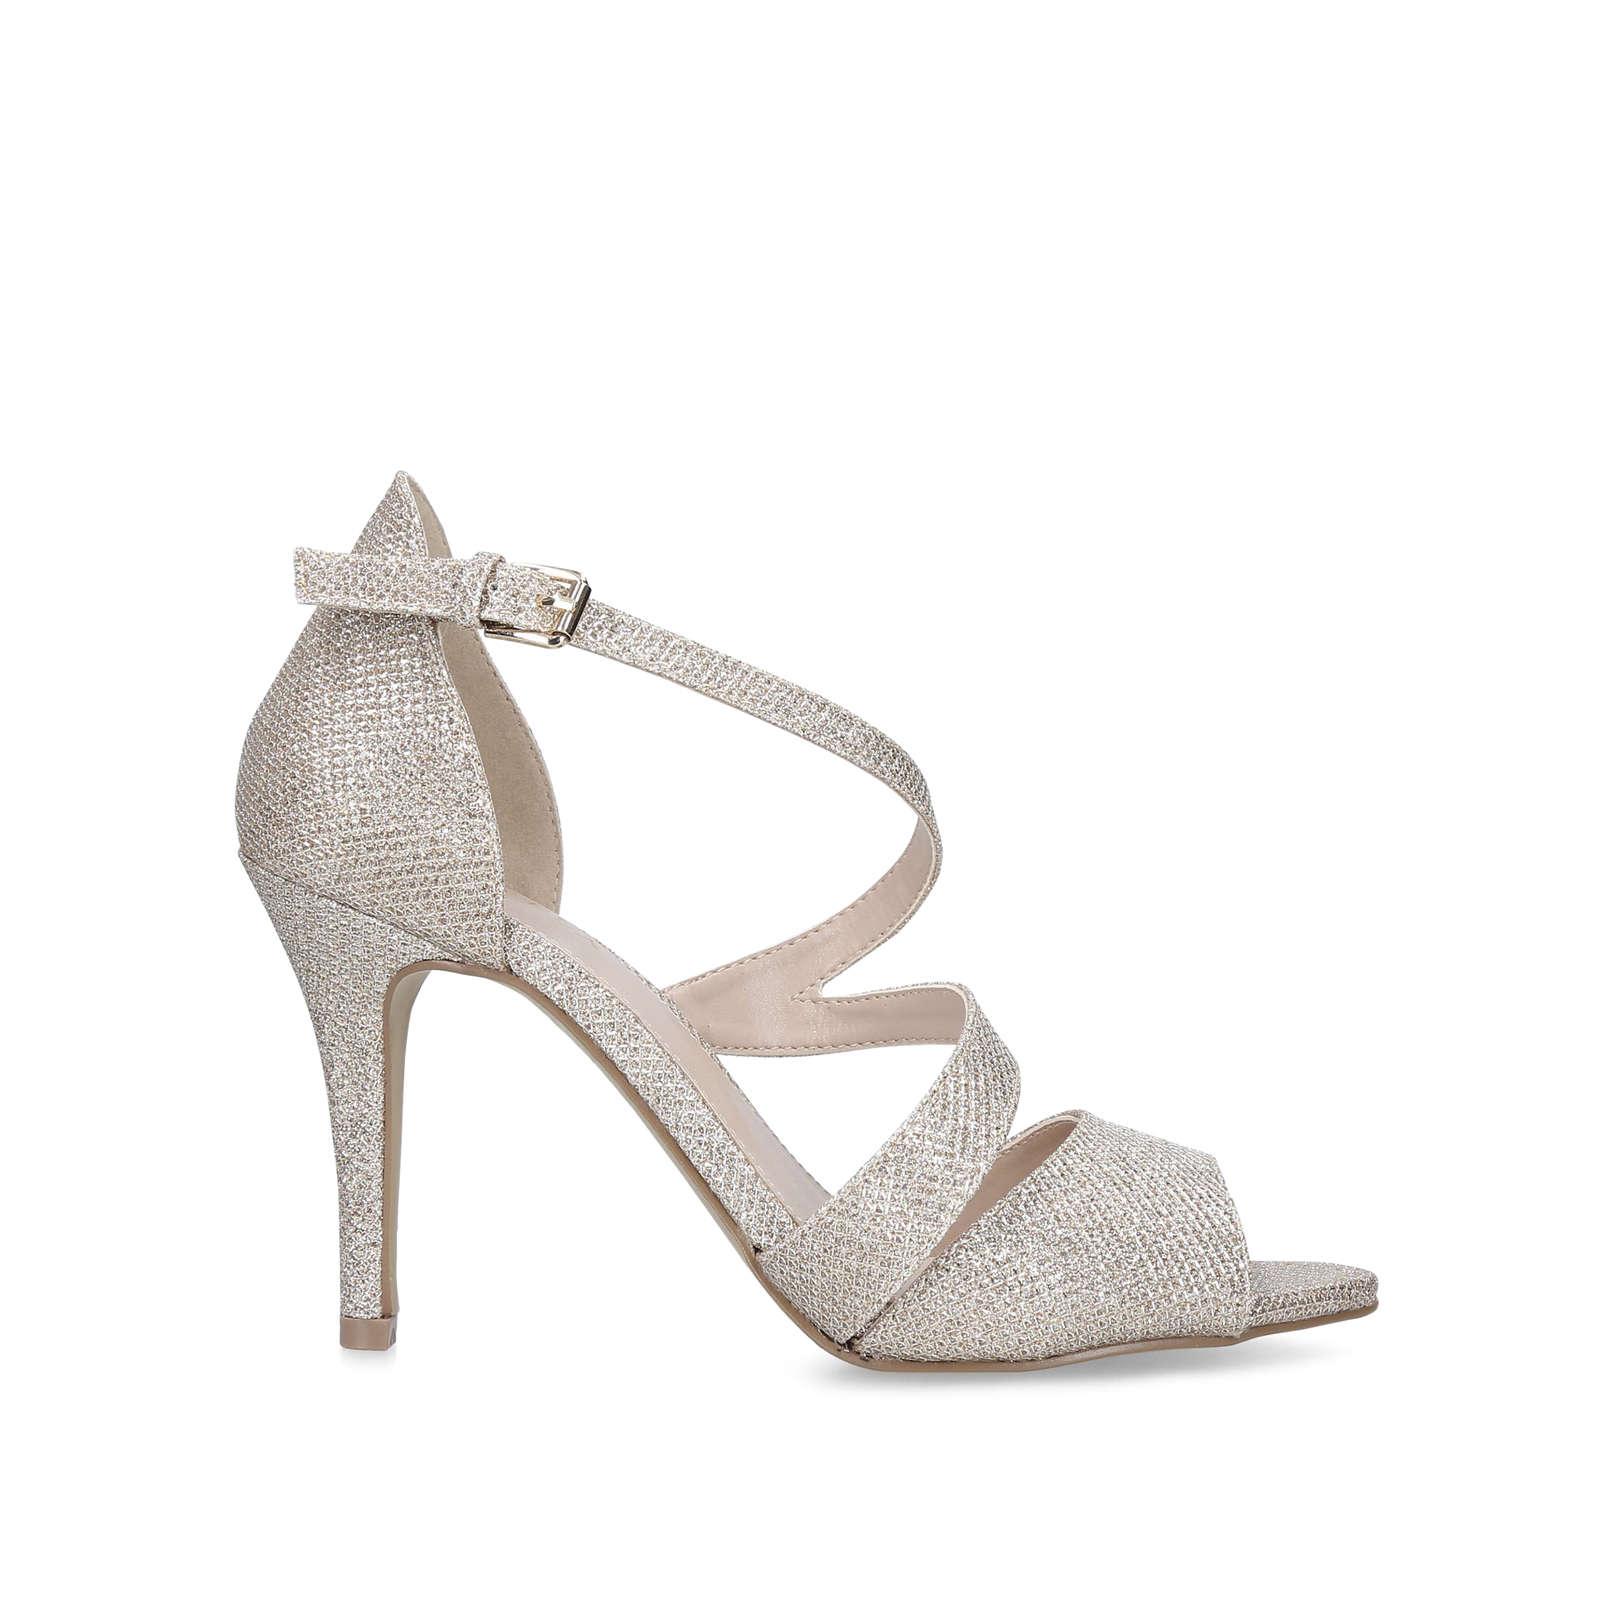 a0ed1ccd869 Lightning Metallic Gold Stiletto Heel Sandals